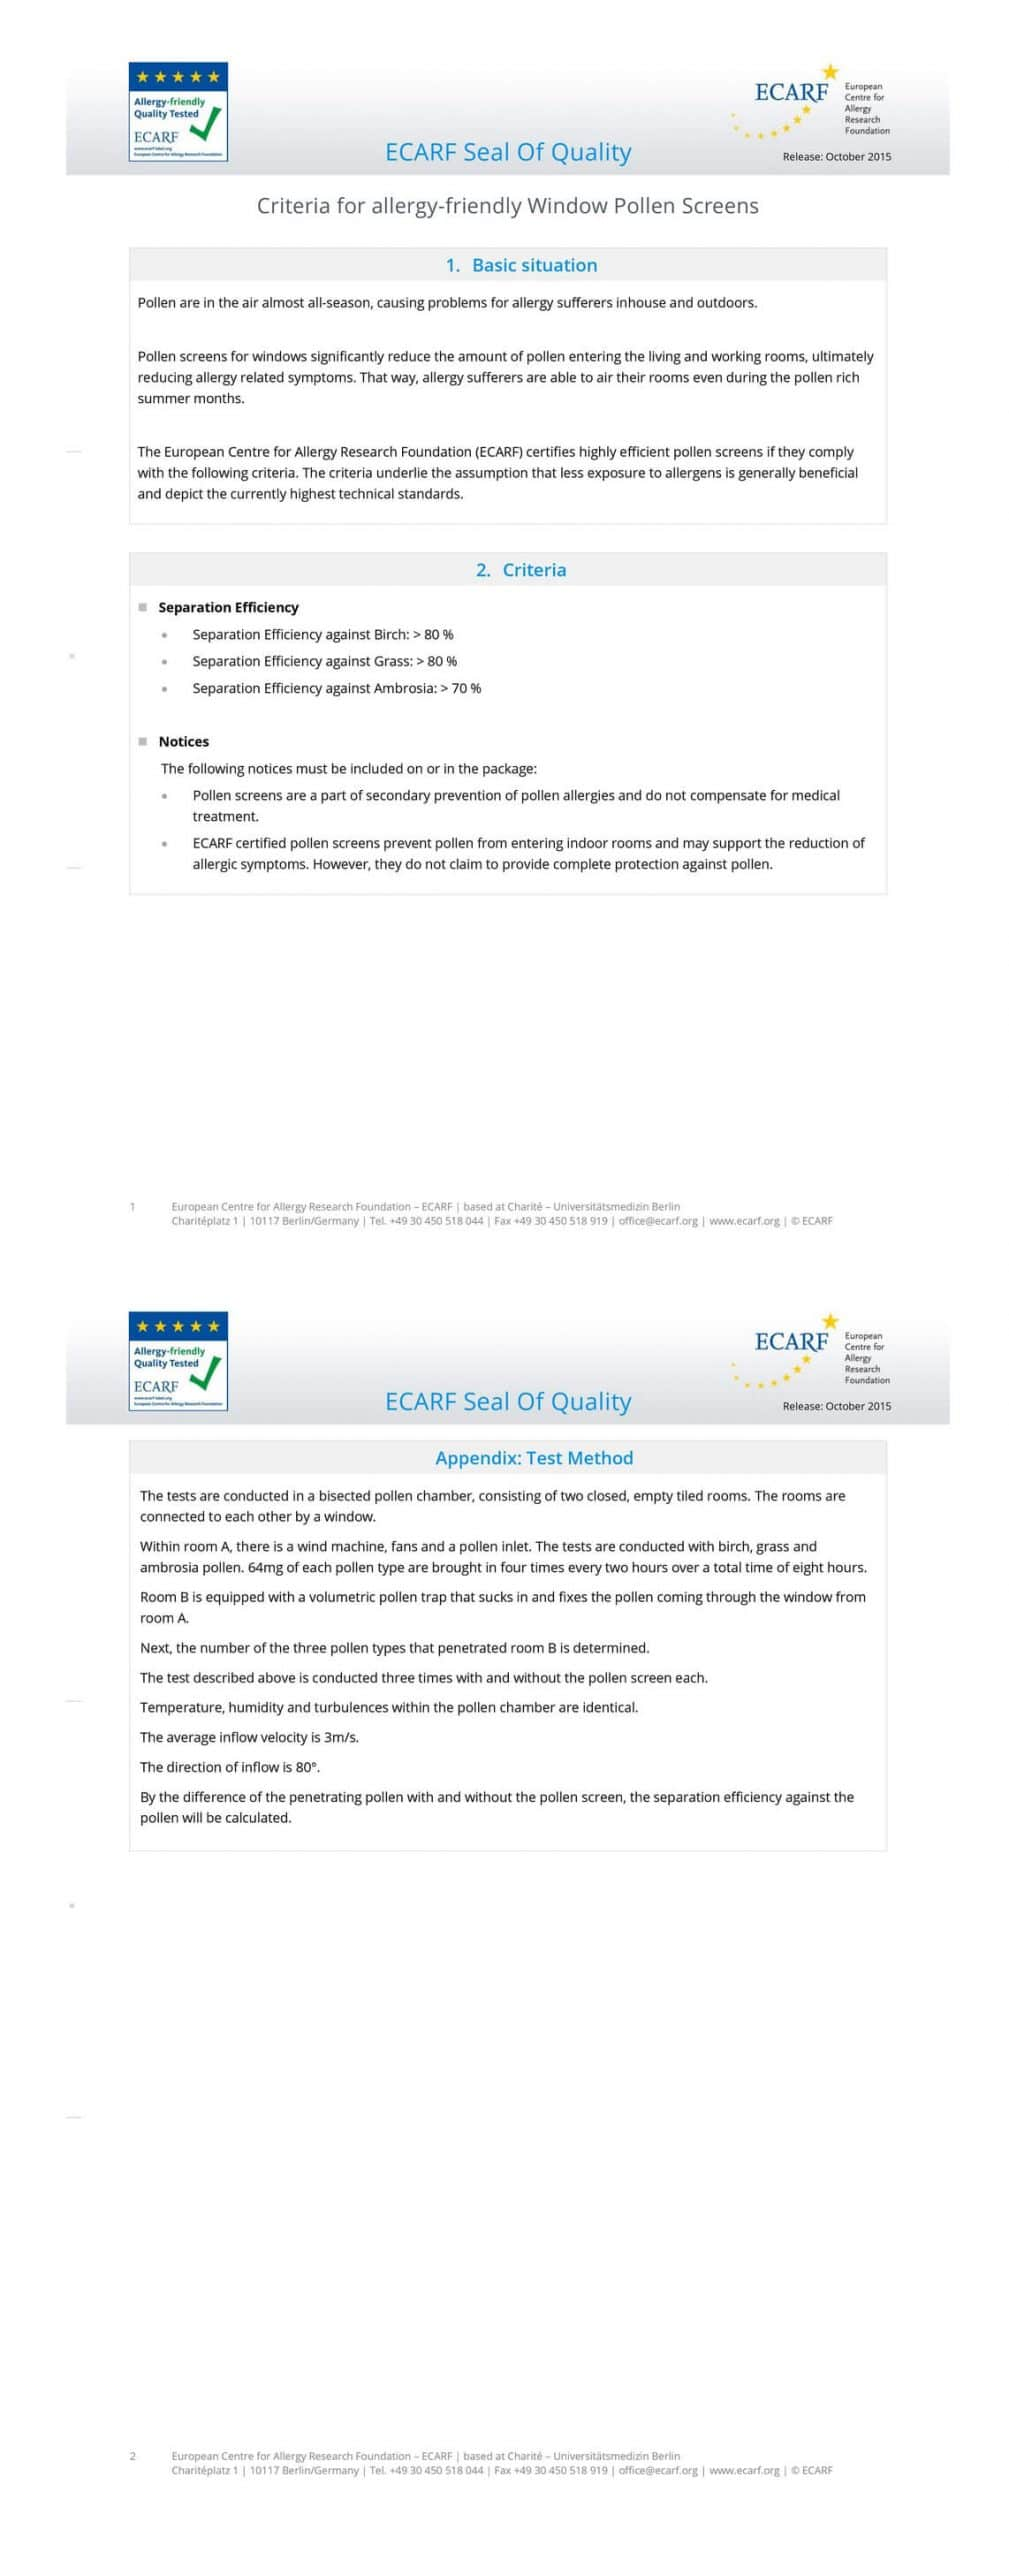 ECARF測試標準說明_ALL-scaled